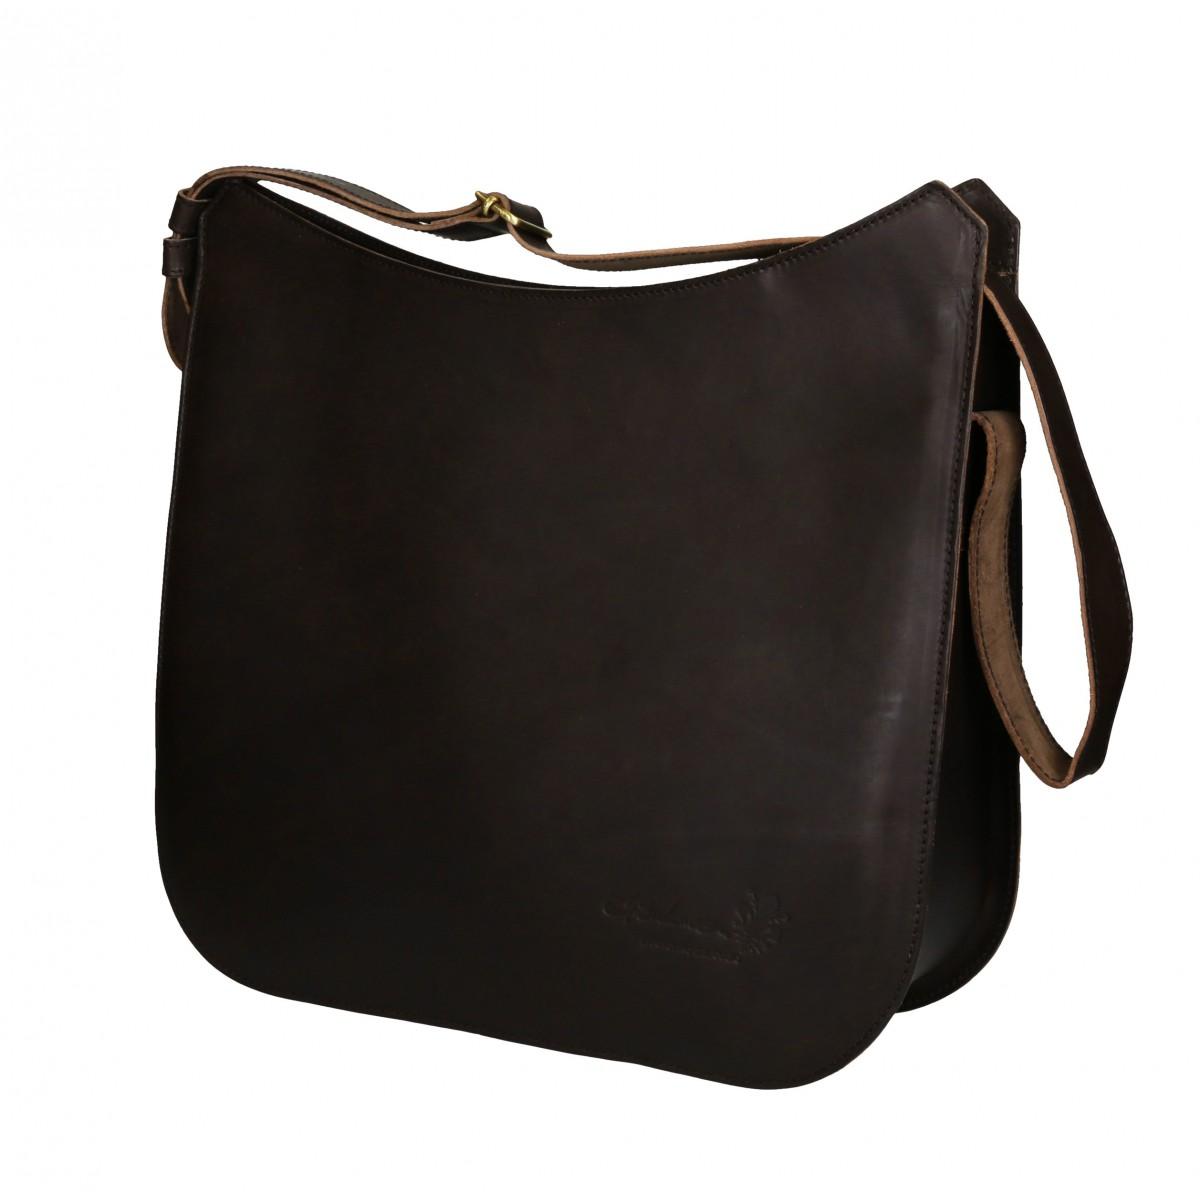 sac en cuir marron bandouli re fait main en italie gianluca l 39 artisan du cuir. Black Bedroom Furniture Sets. Home Design Ideas